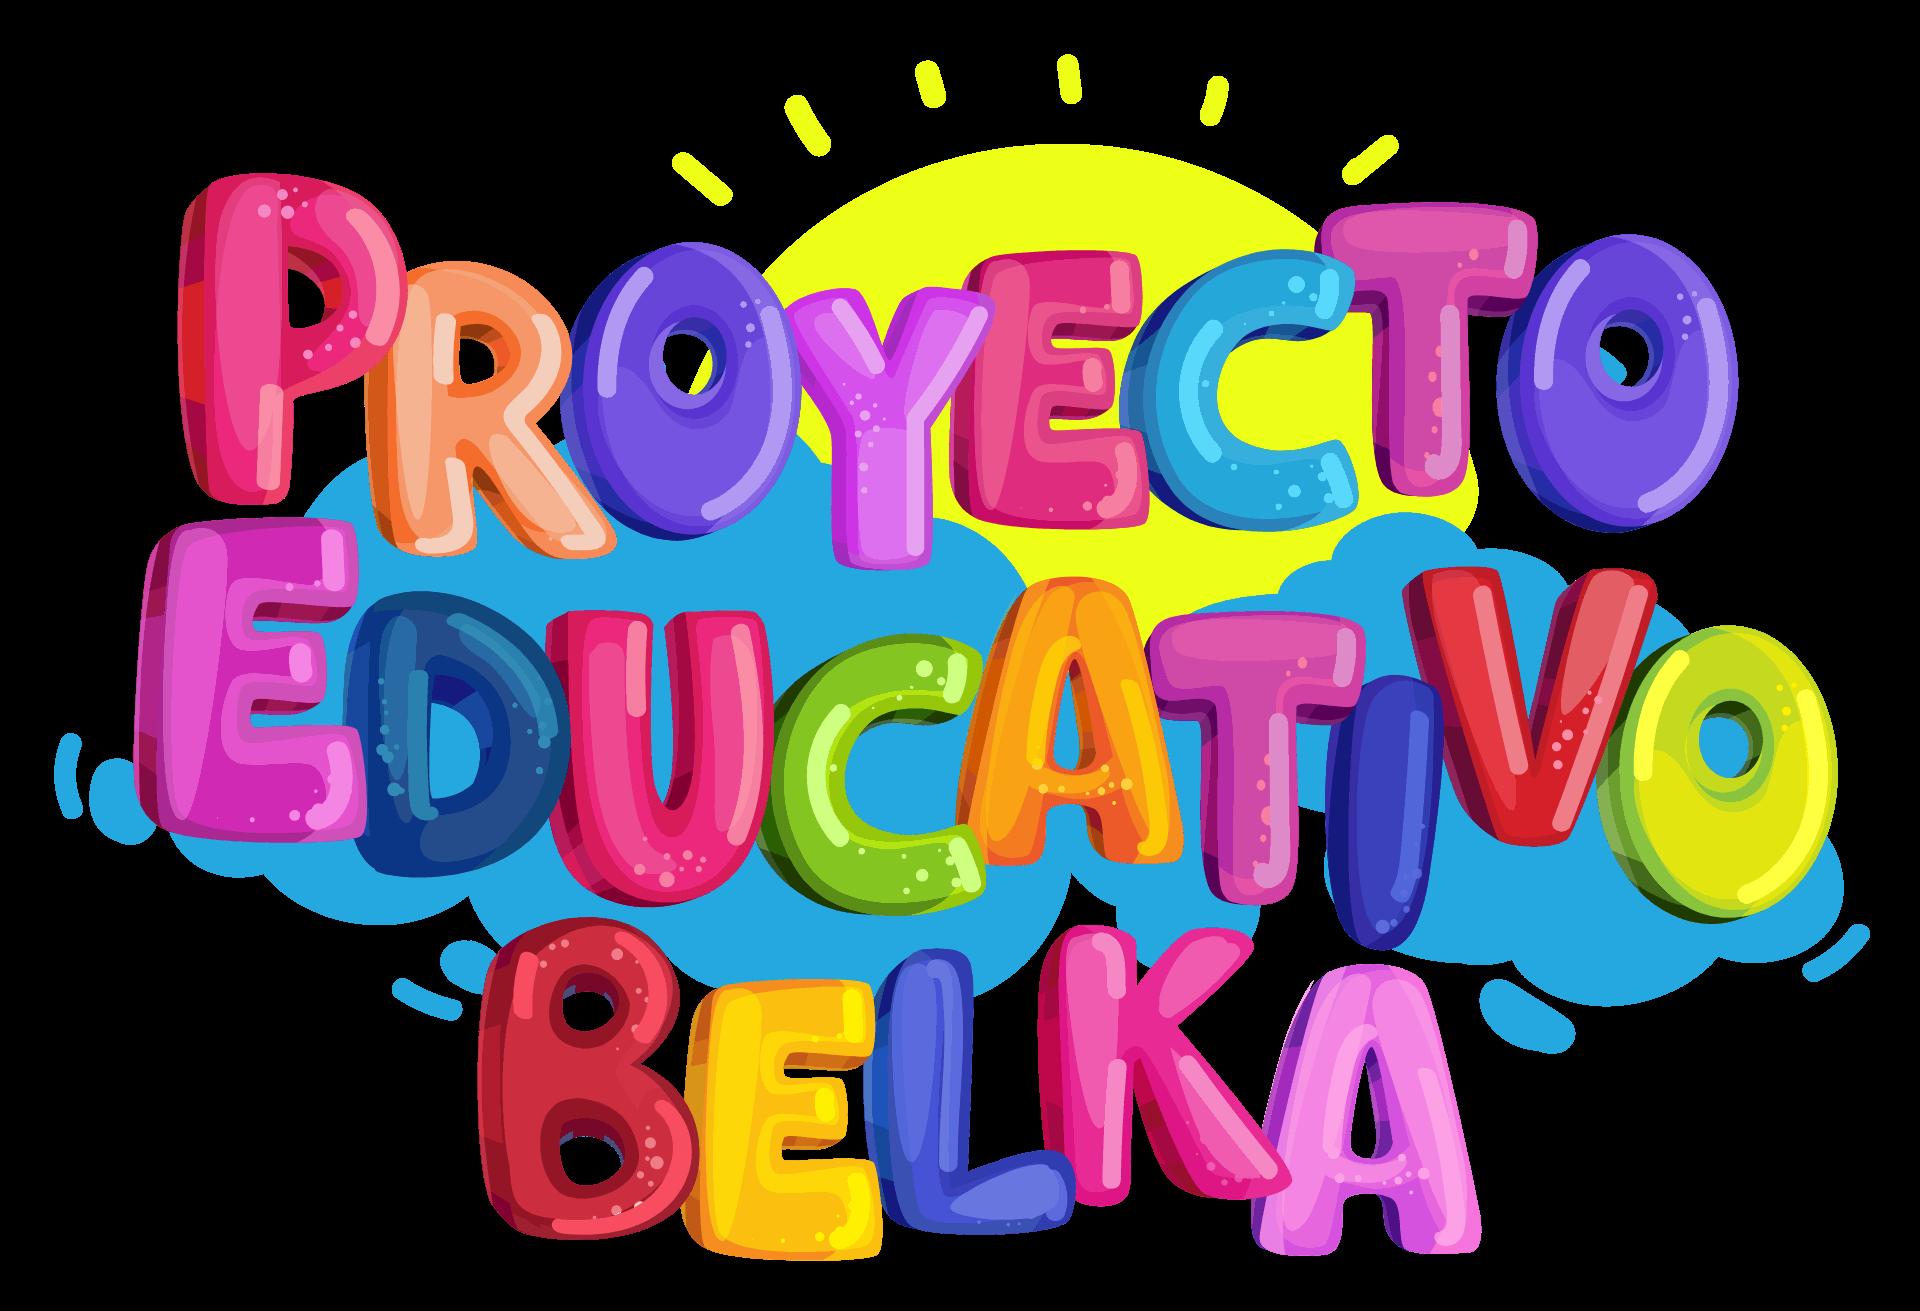 proyecto educativo belka